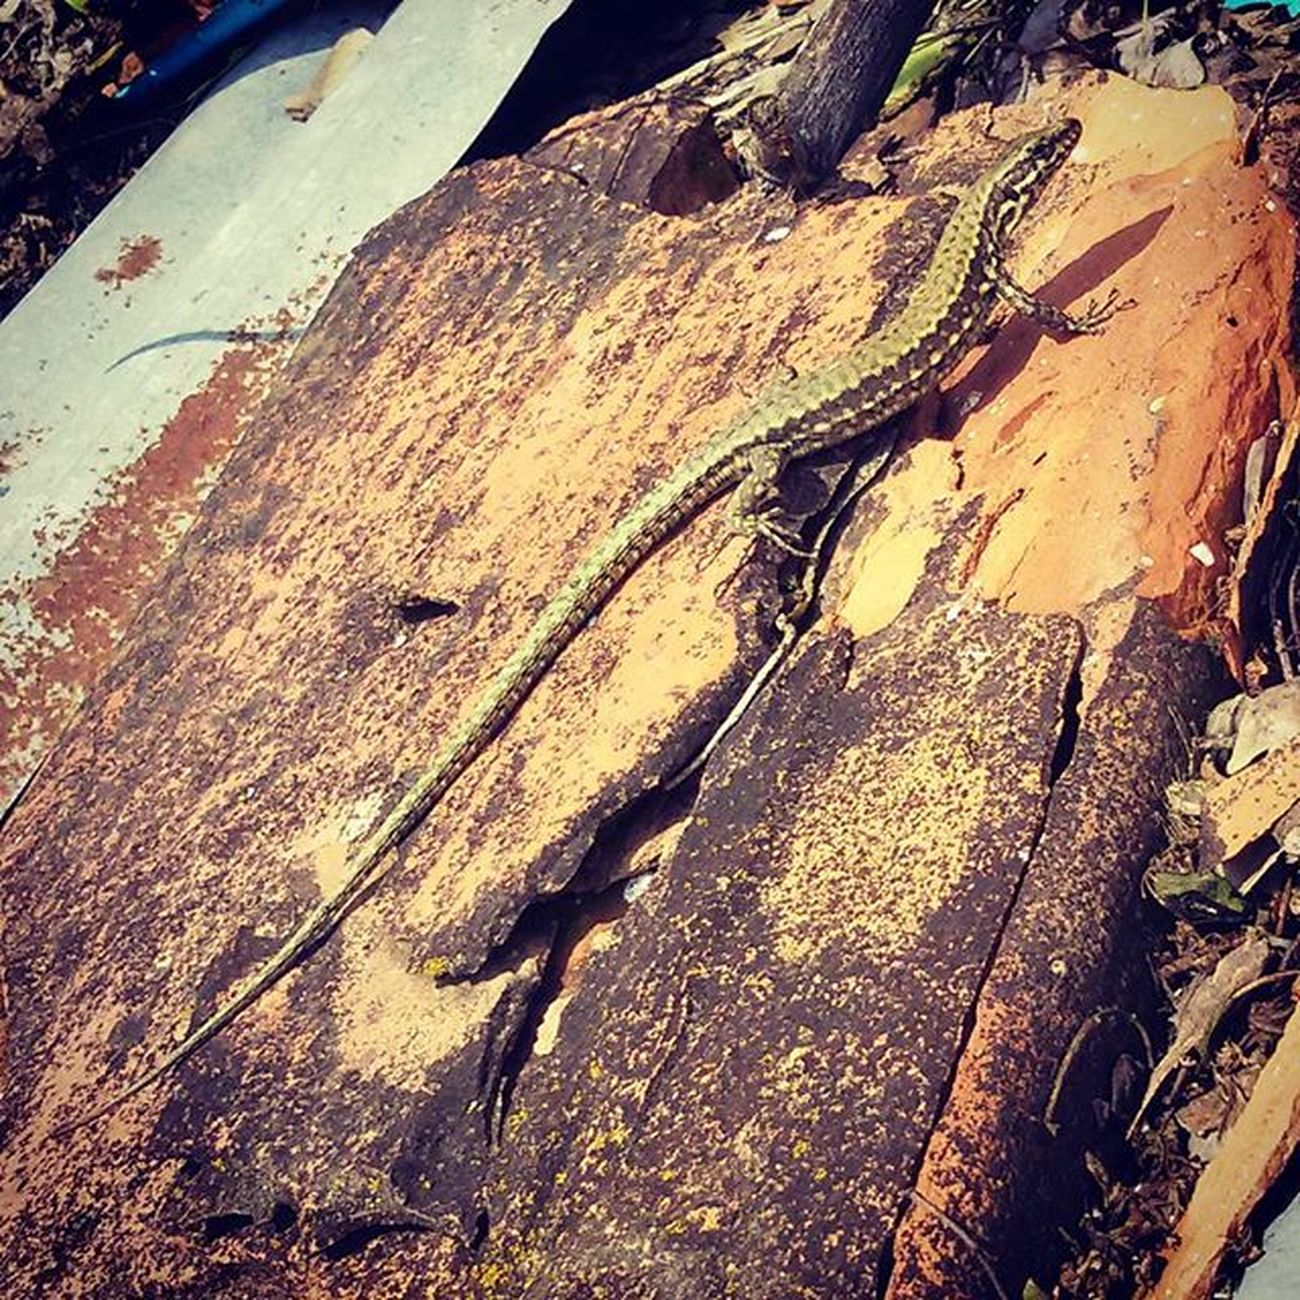 Lucertola Animaleasanguefreddo Rettile Lizard Coldbloodedanimal Reptile